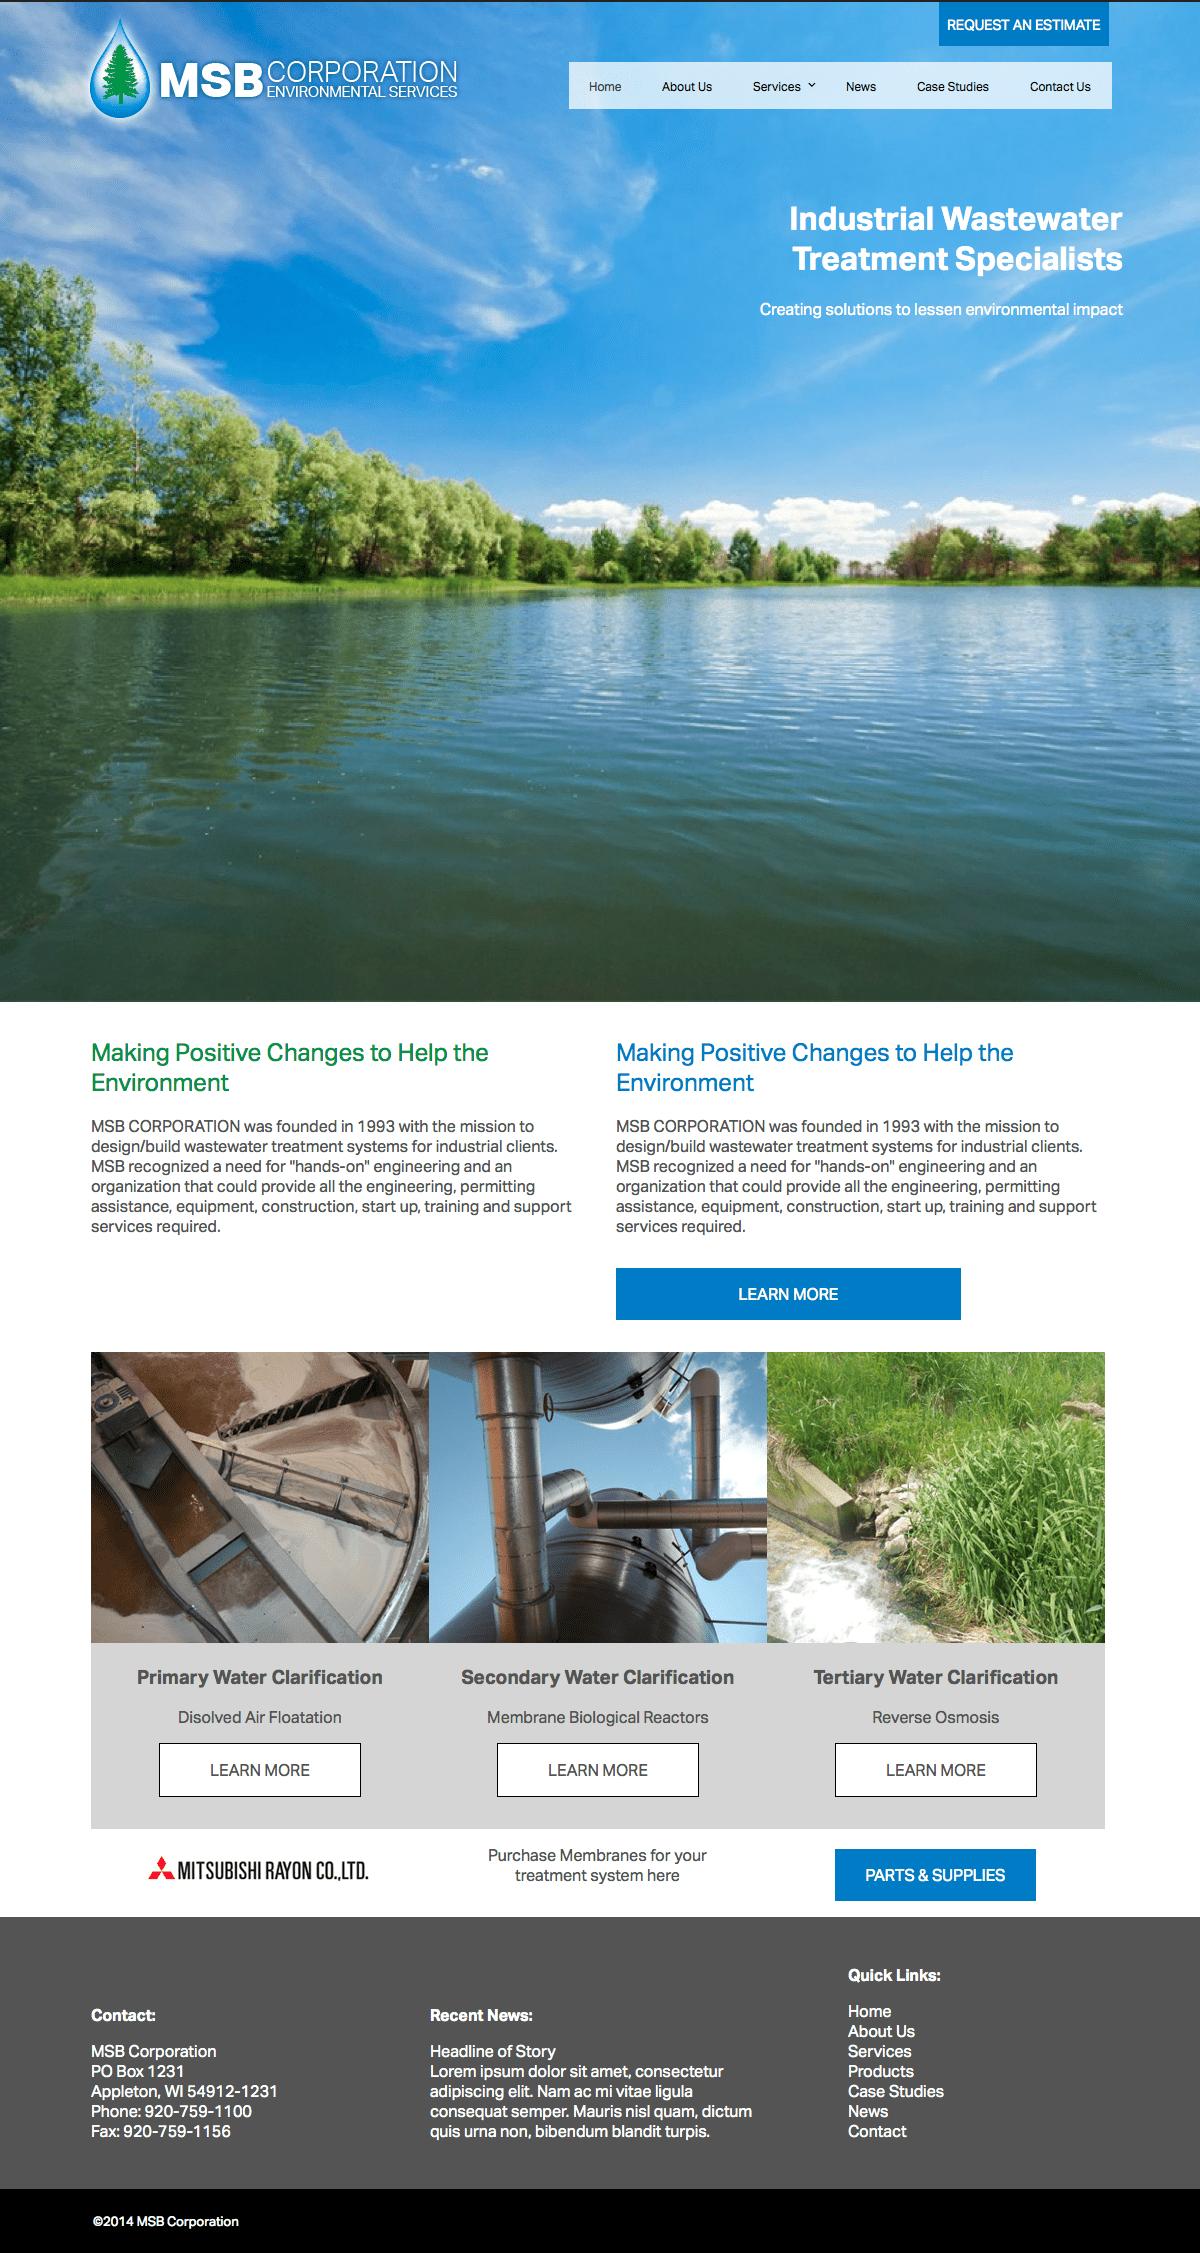 MSB Environmental Corp. announces new website